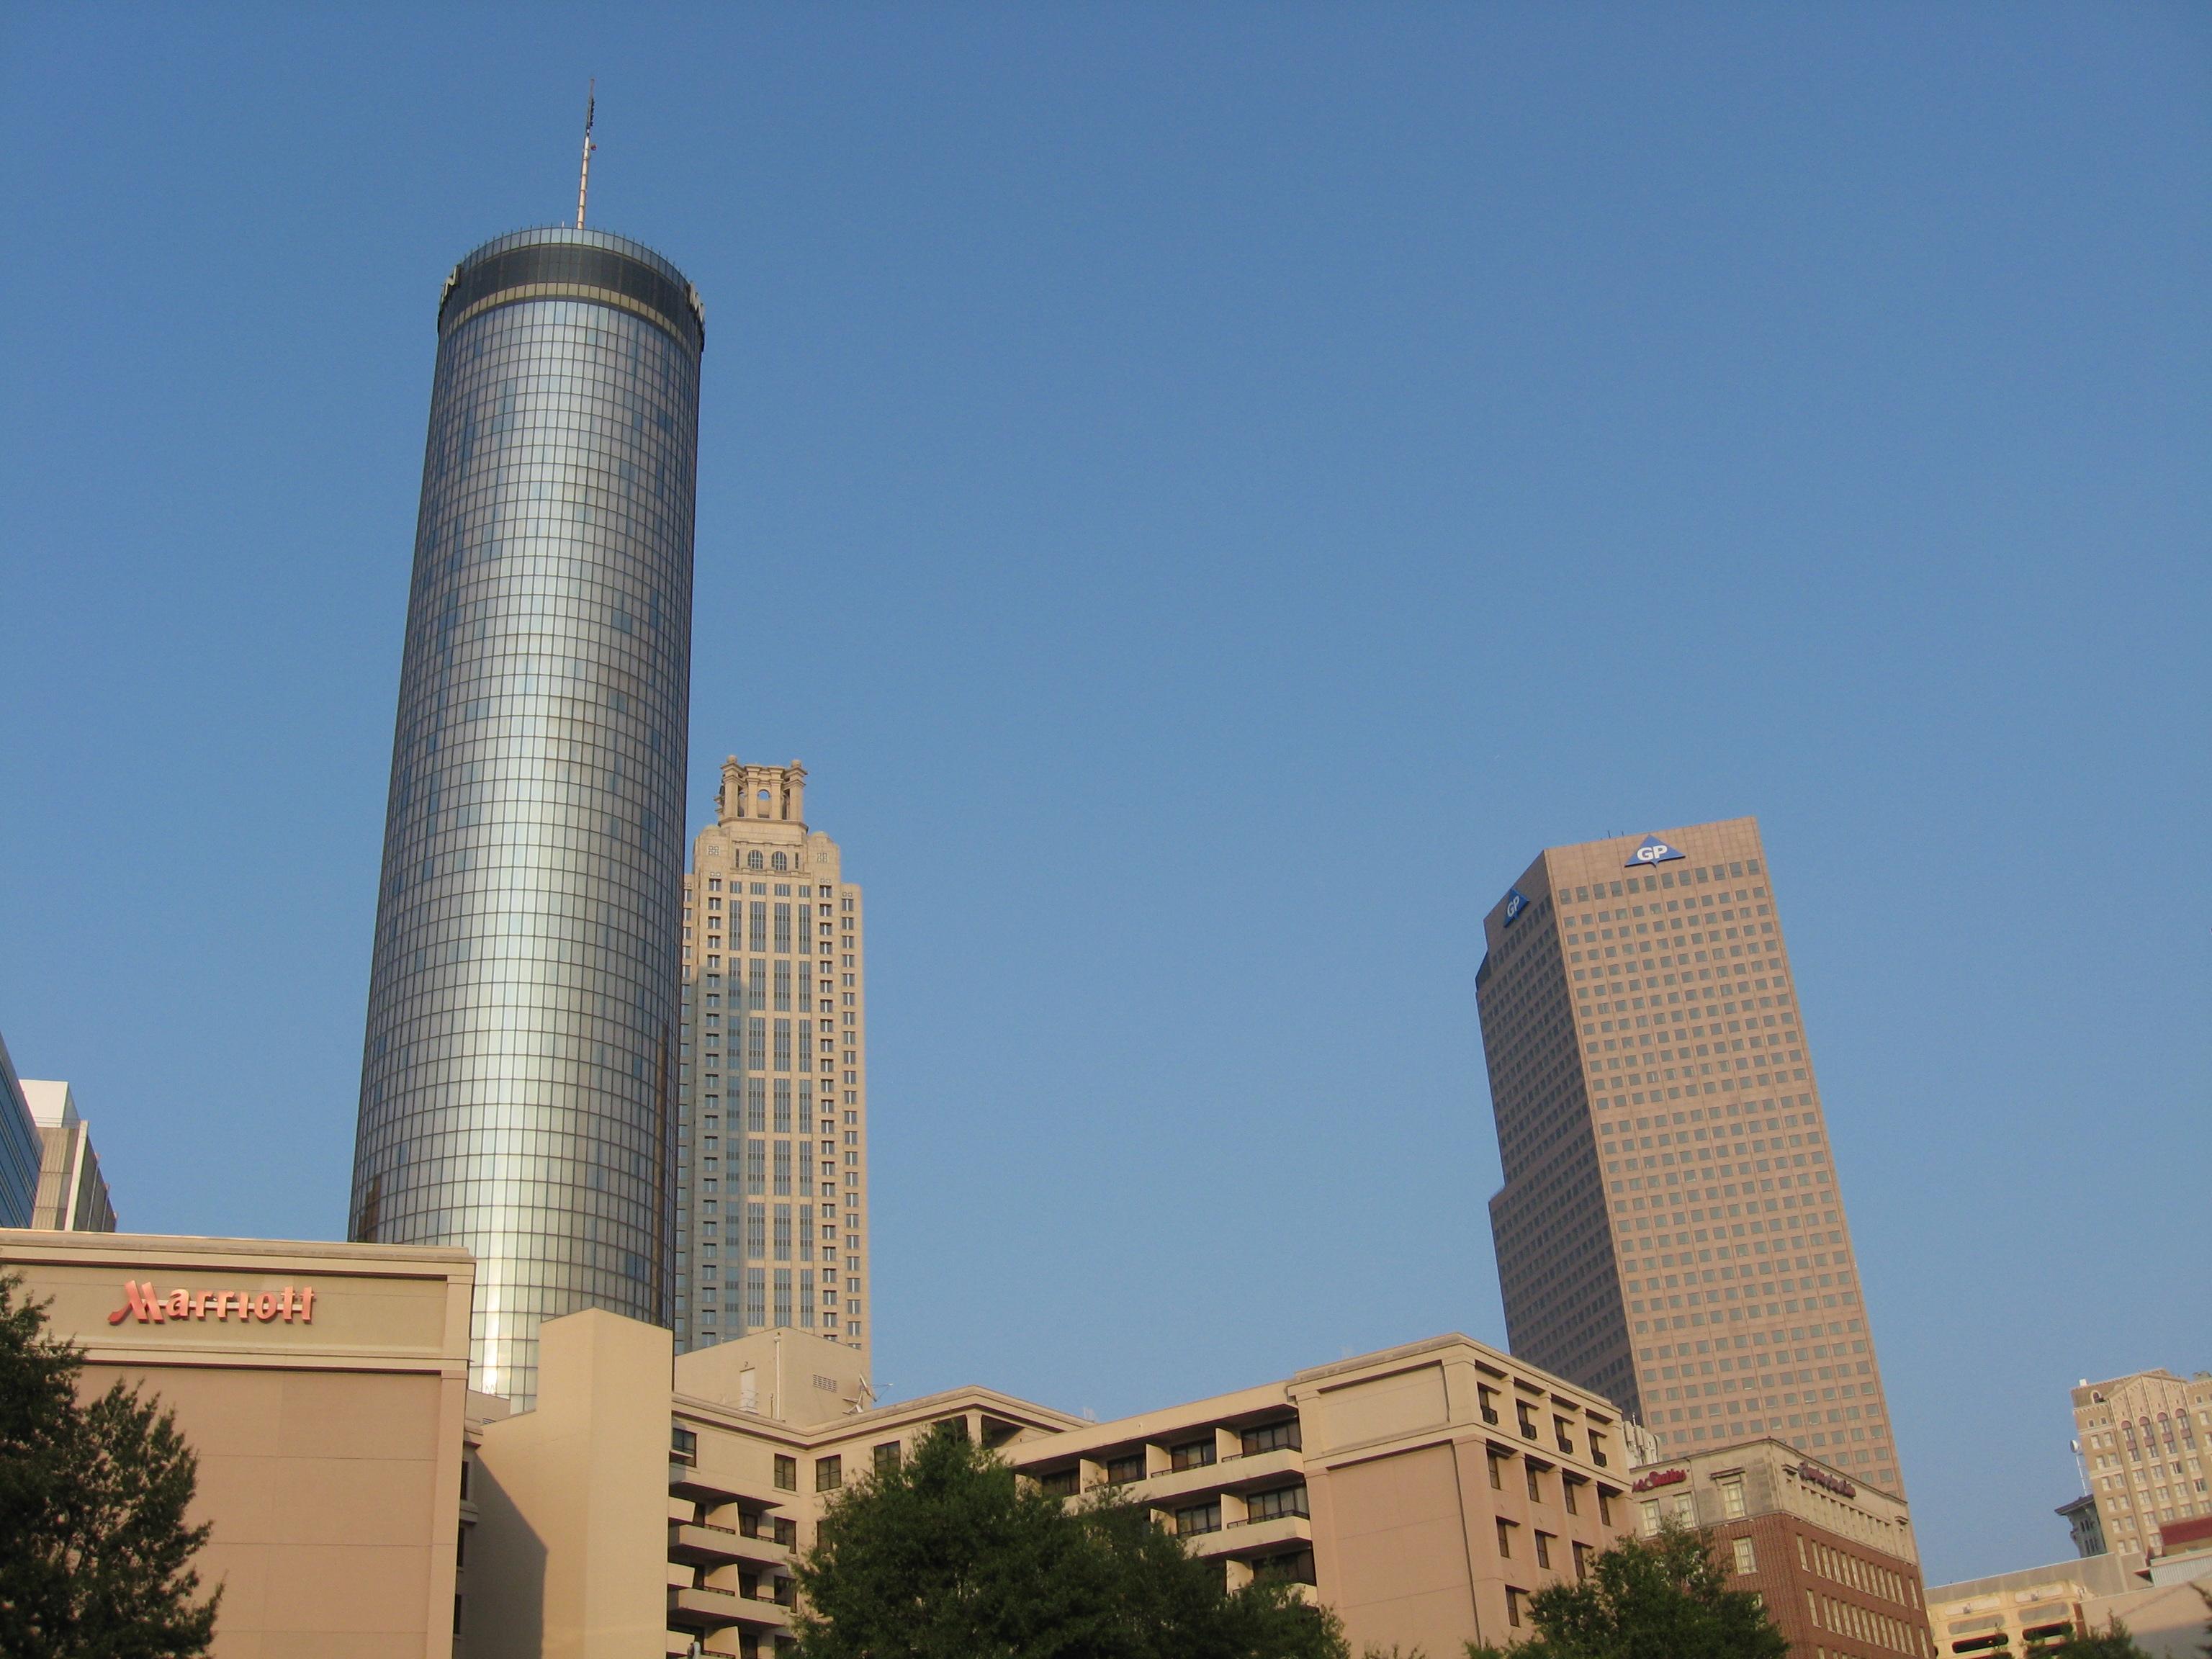 File:Westin Peachtree Plaza, 191 Peachtree Tower, Georgia